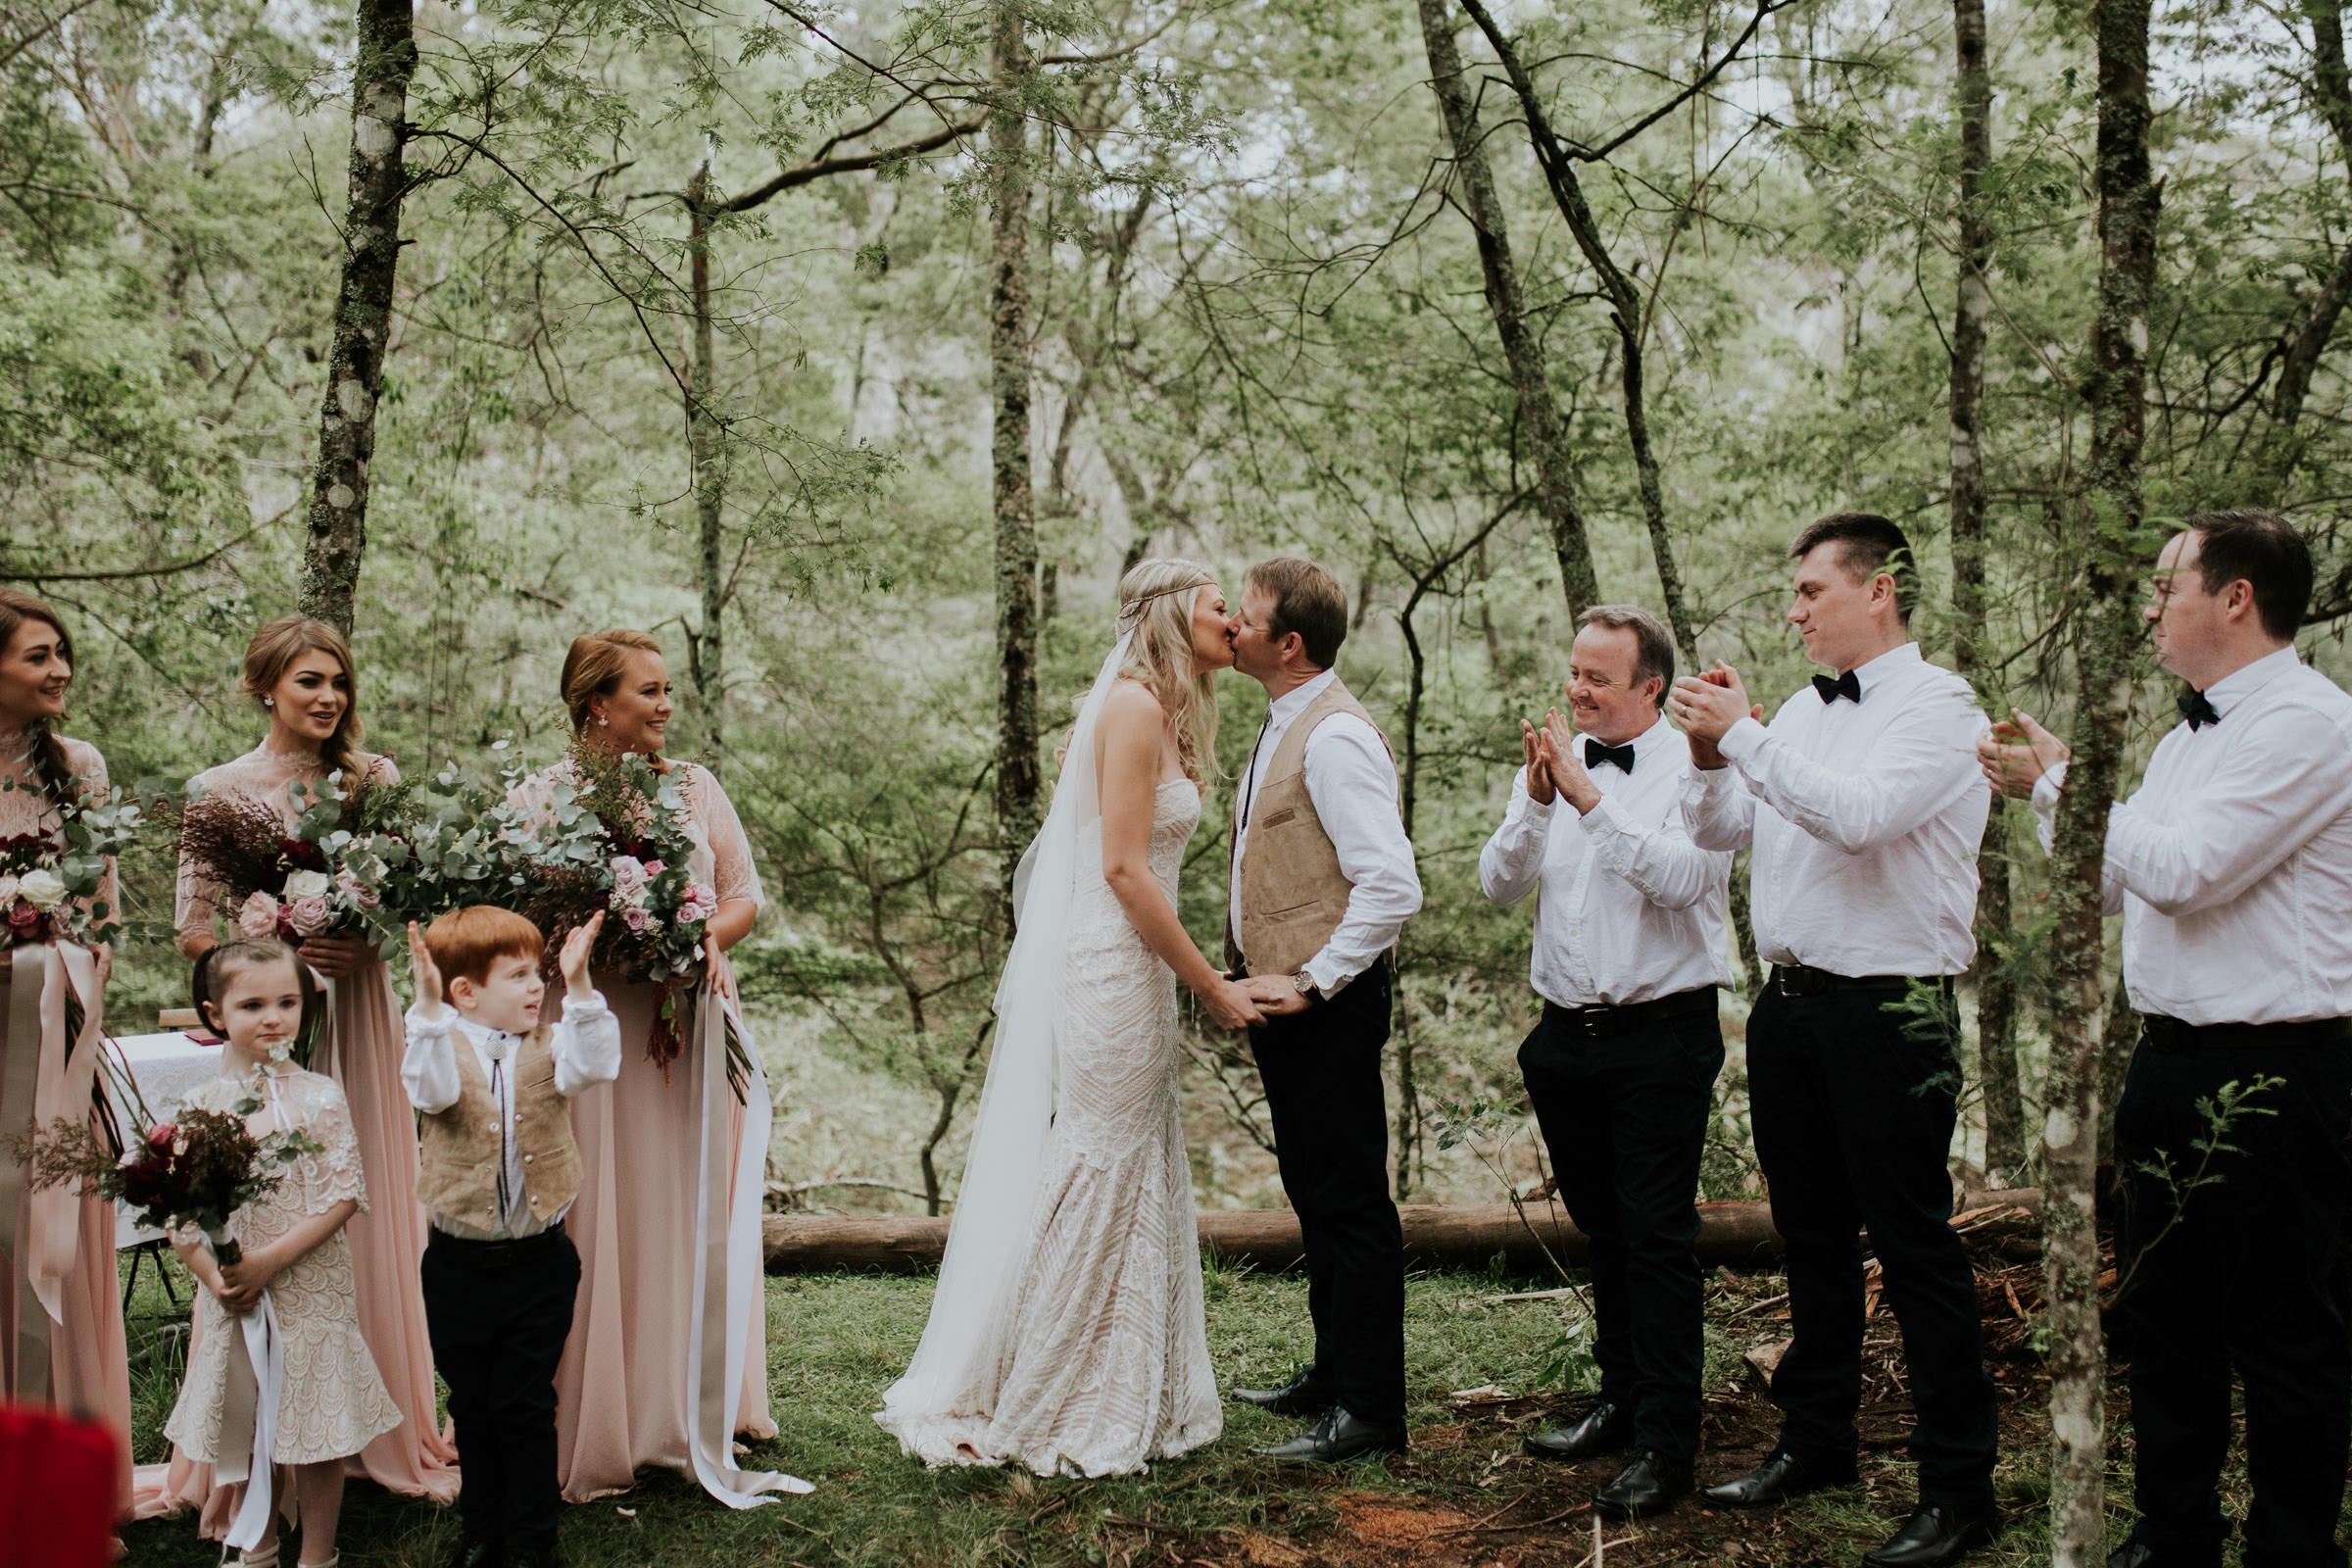 Emma+John+Far+South+Coast+Wedding+Festivl+Glamping+Bush-107.jpg